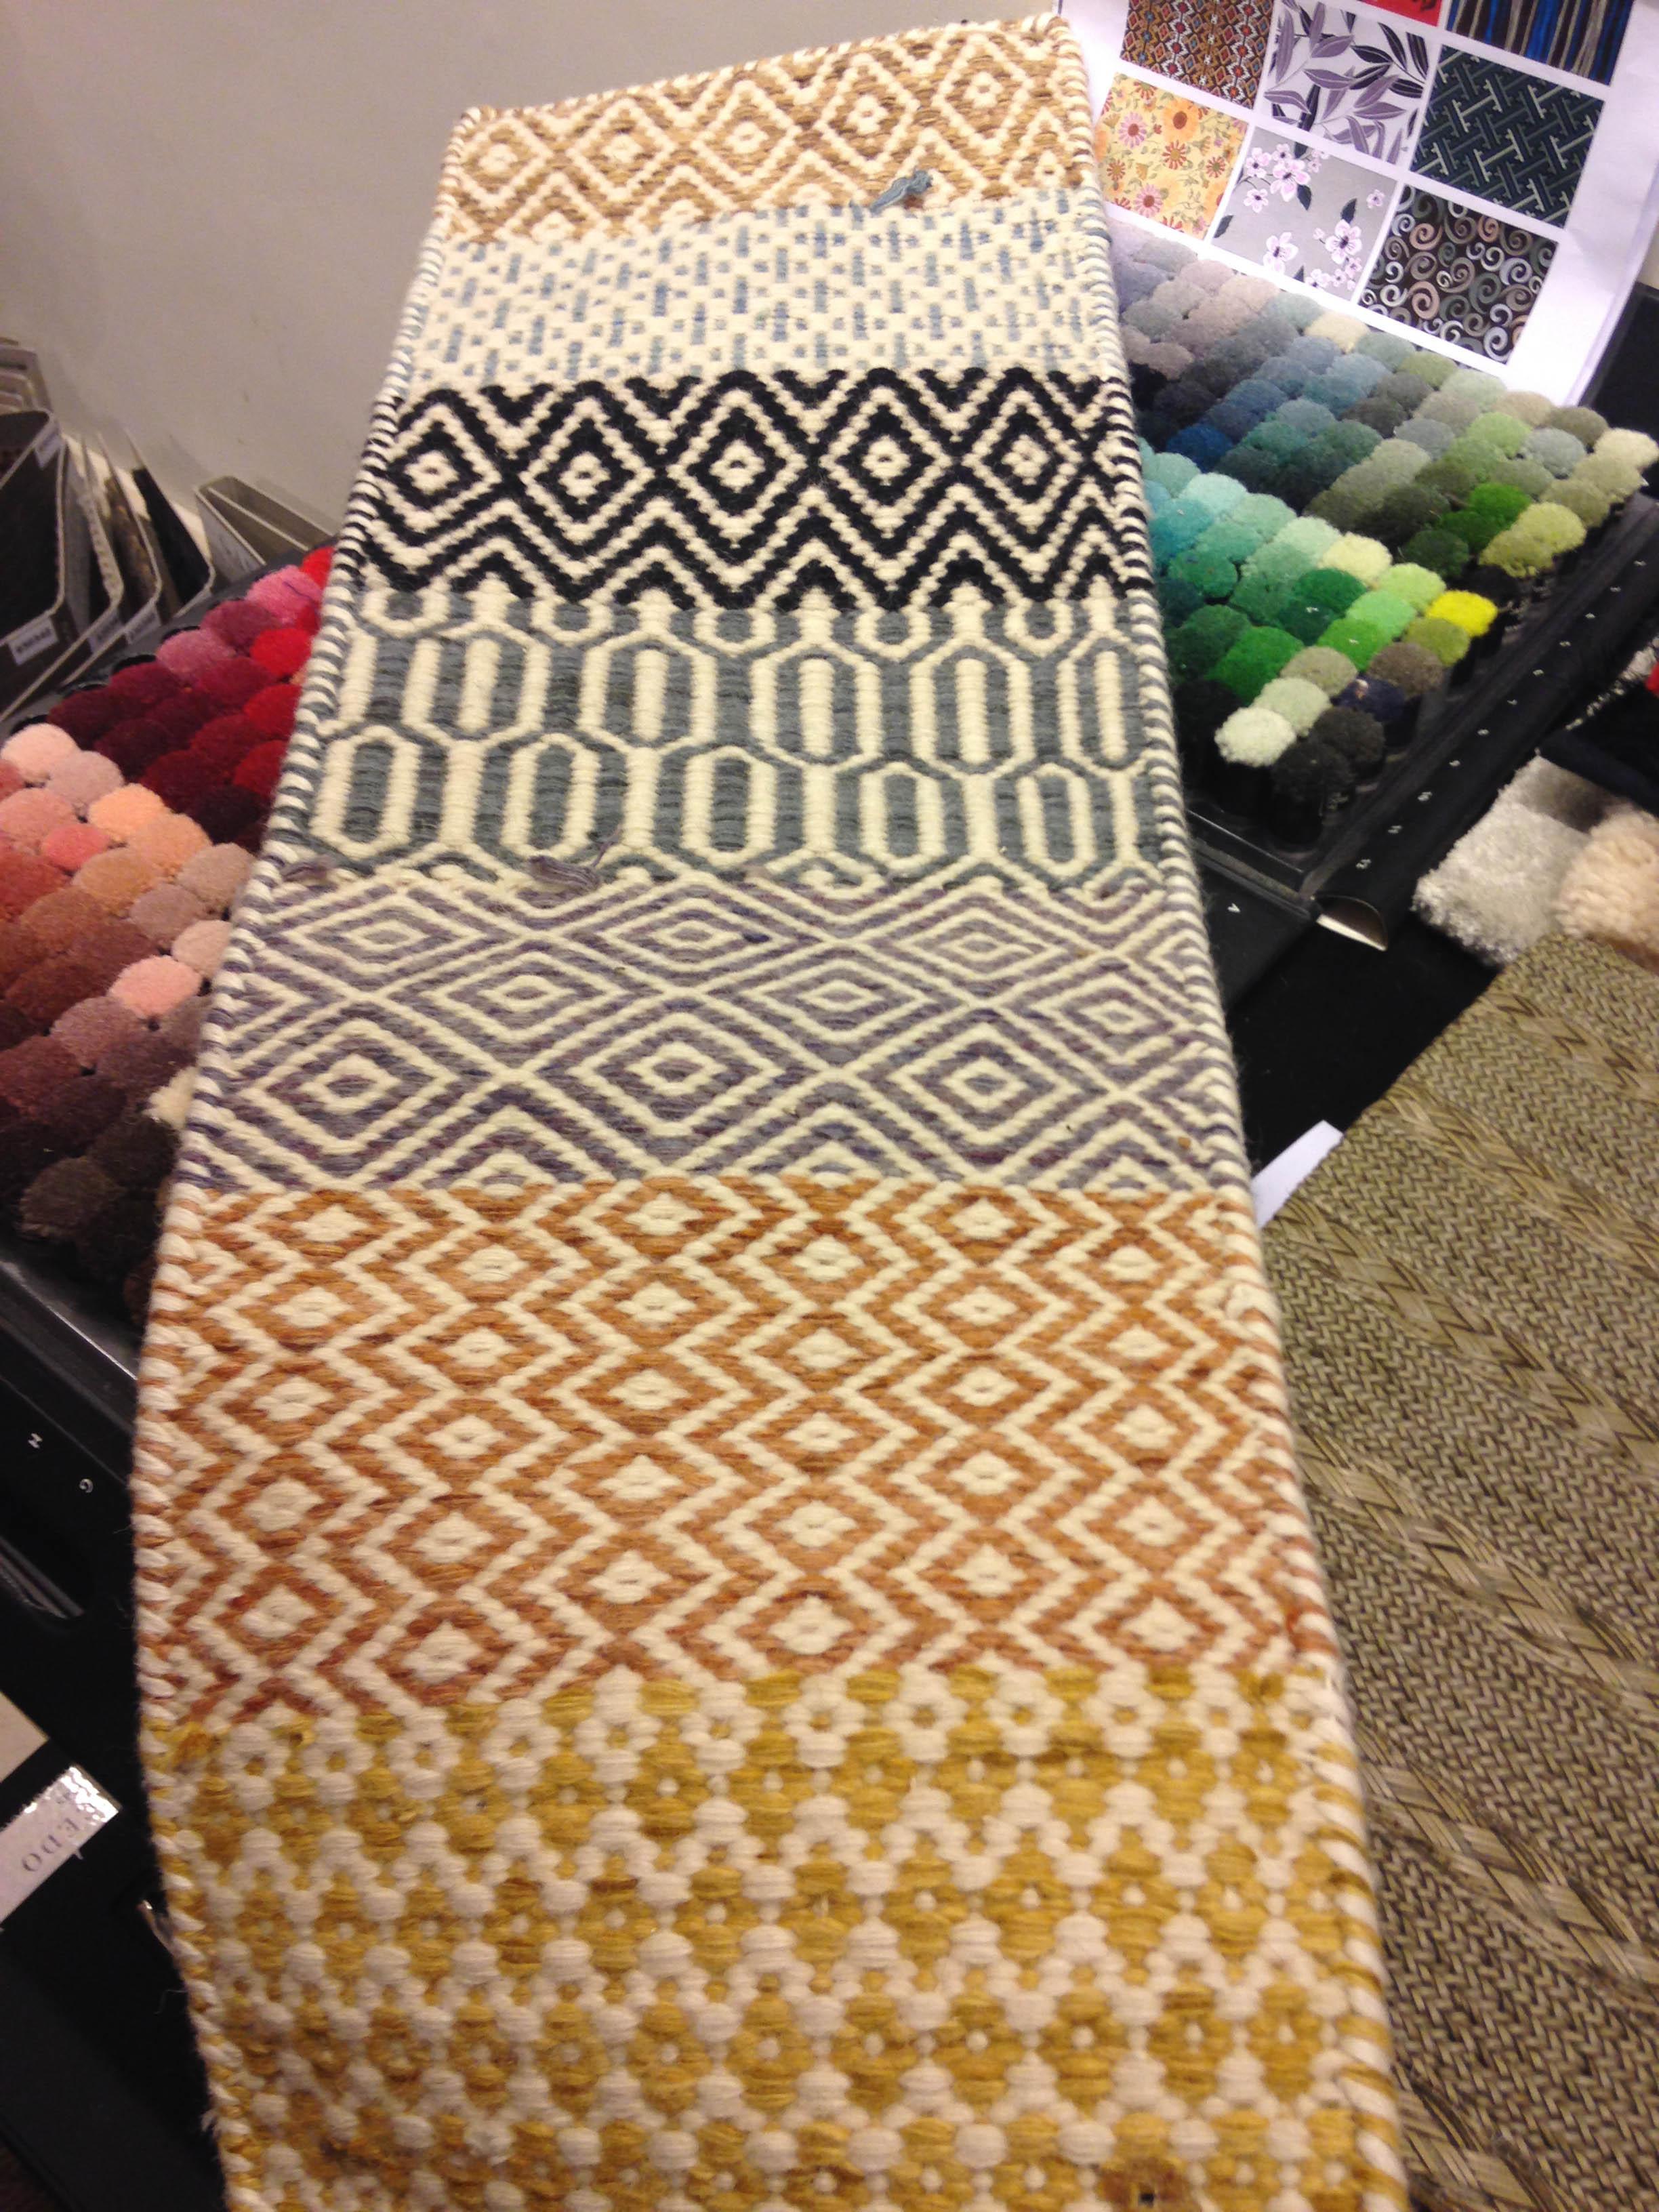 Gancedo kiln shop ab mobiliario estudio dise o y escuela de dise o madrid - Gancedo telas ...